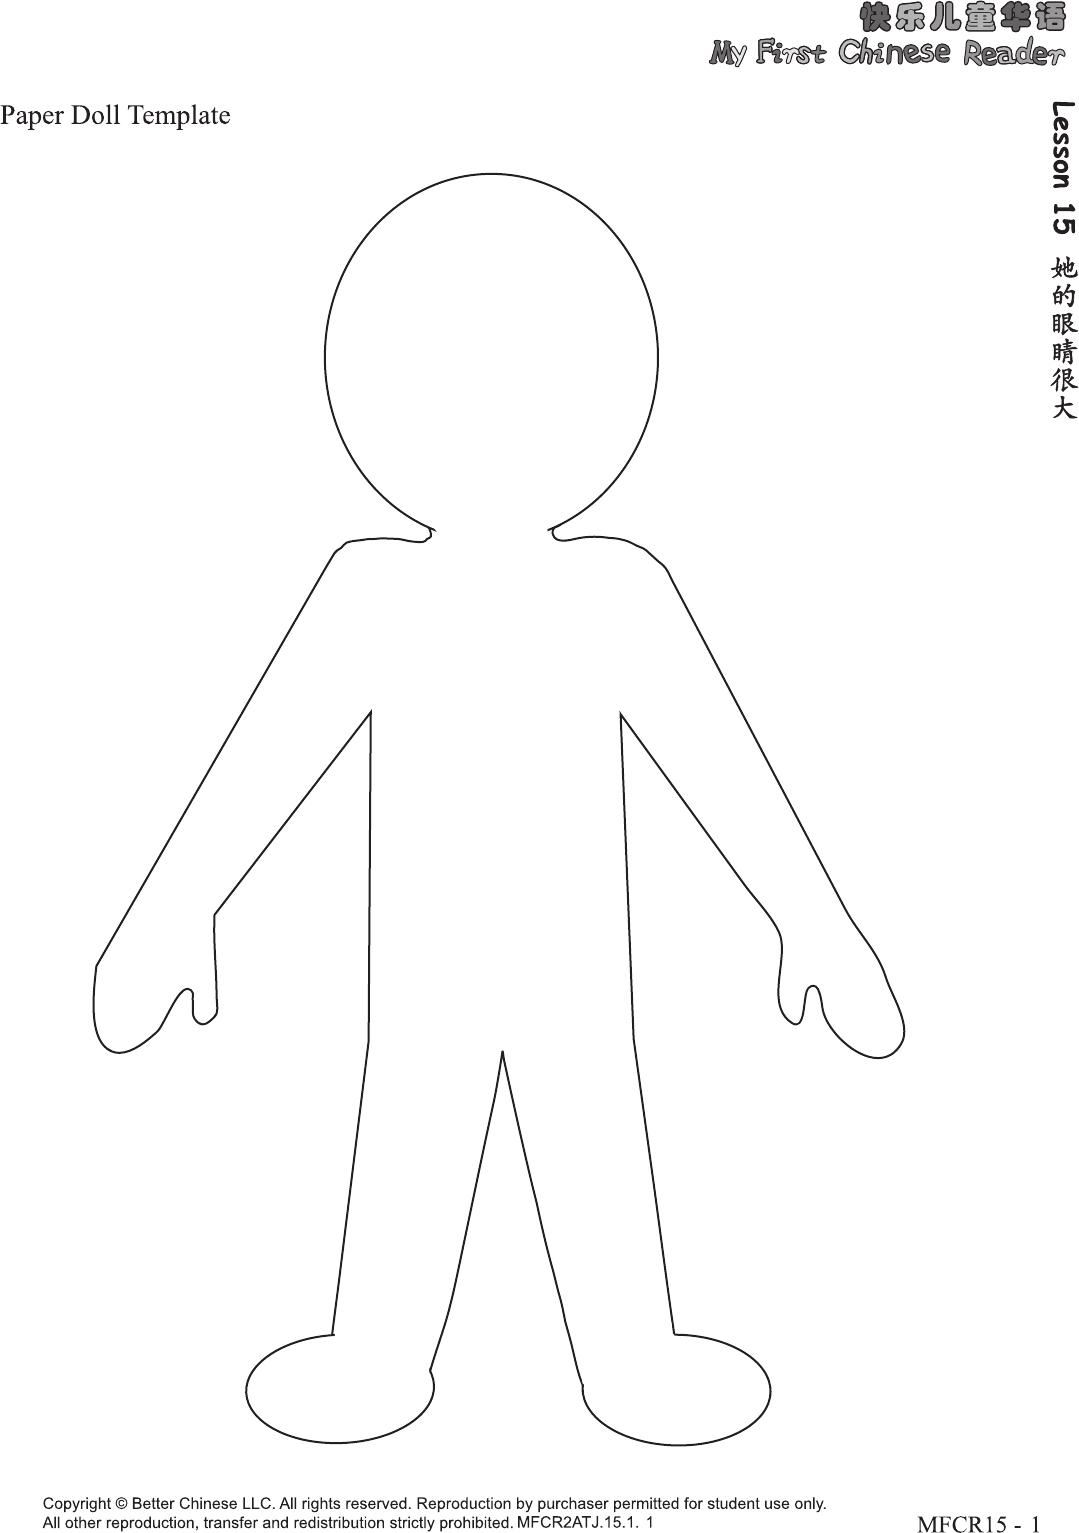 male paper doll cutouts printable cutout paper doll sheet hispanic heritage art paper doll male cutouts